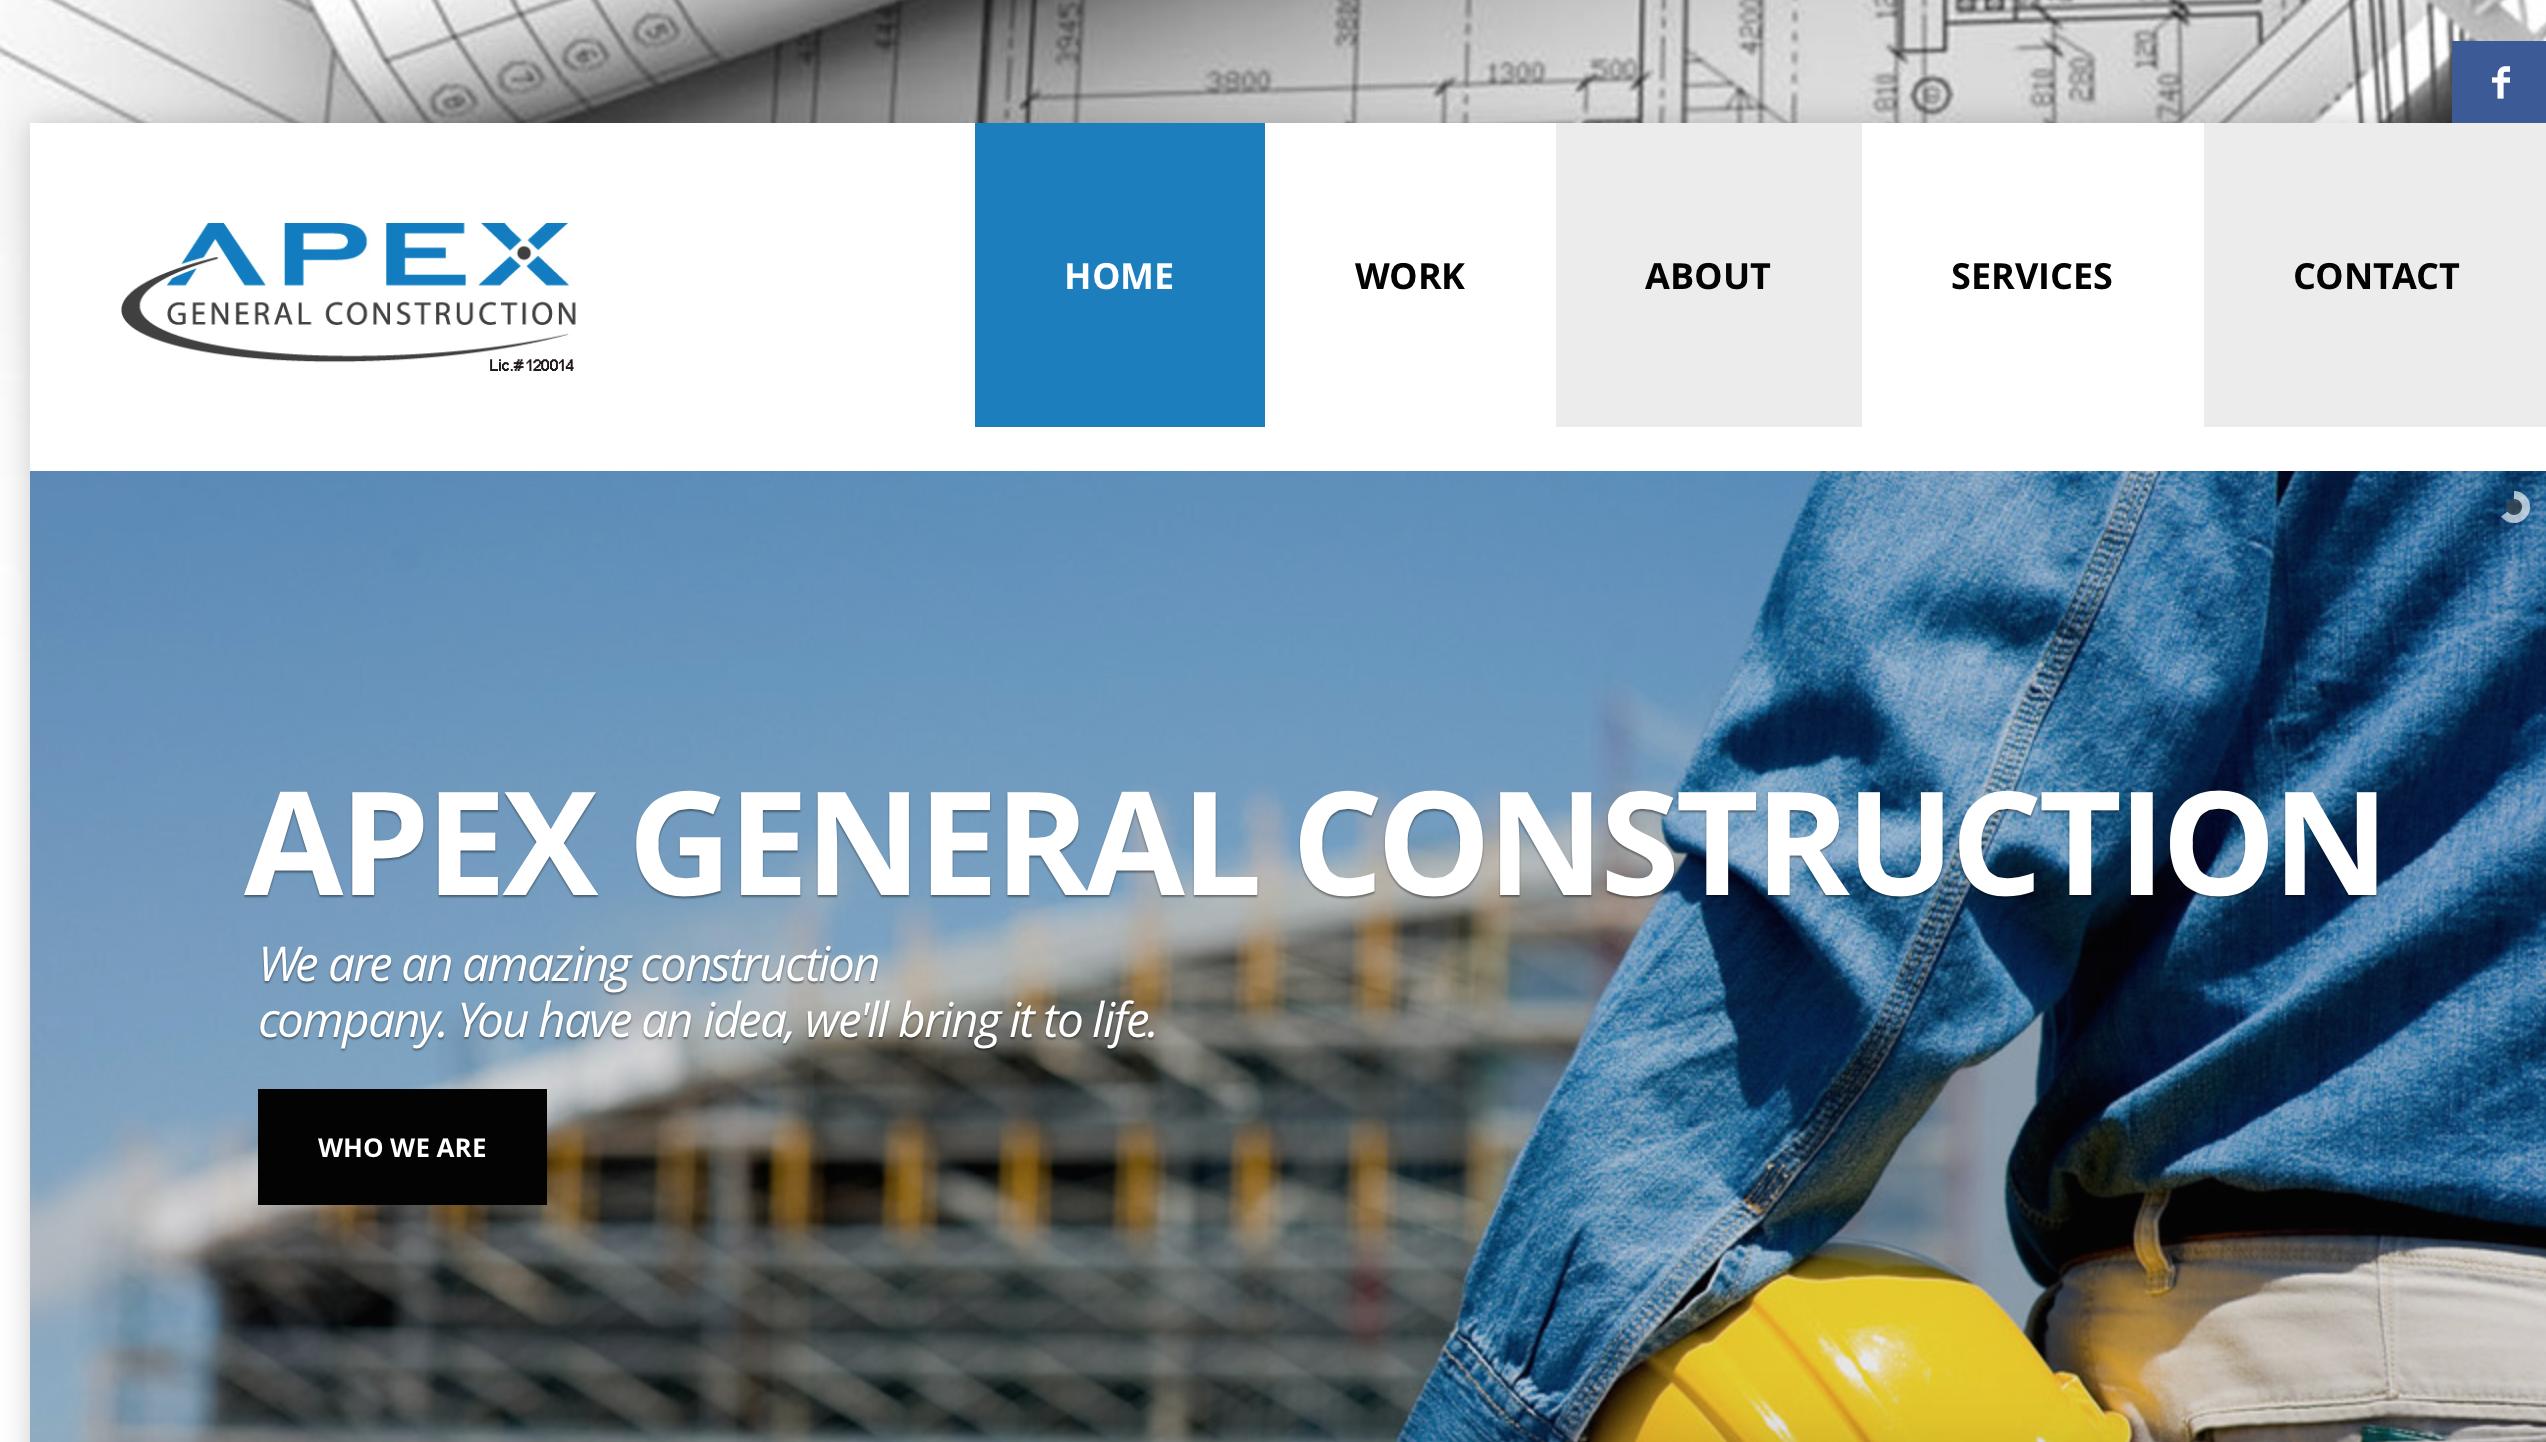 Bakersfield SEO, Bakersfield Logo Design, Acme Web Design, SEO Services, Search Engine Optimization Bakersfield